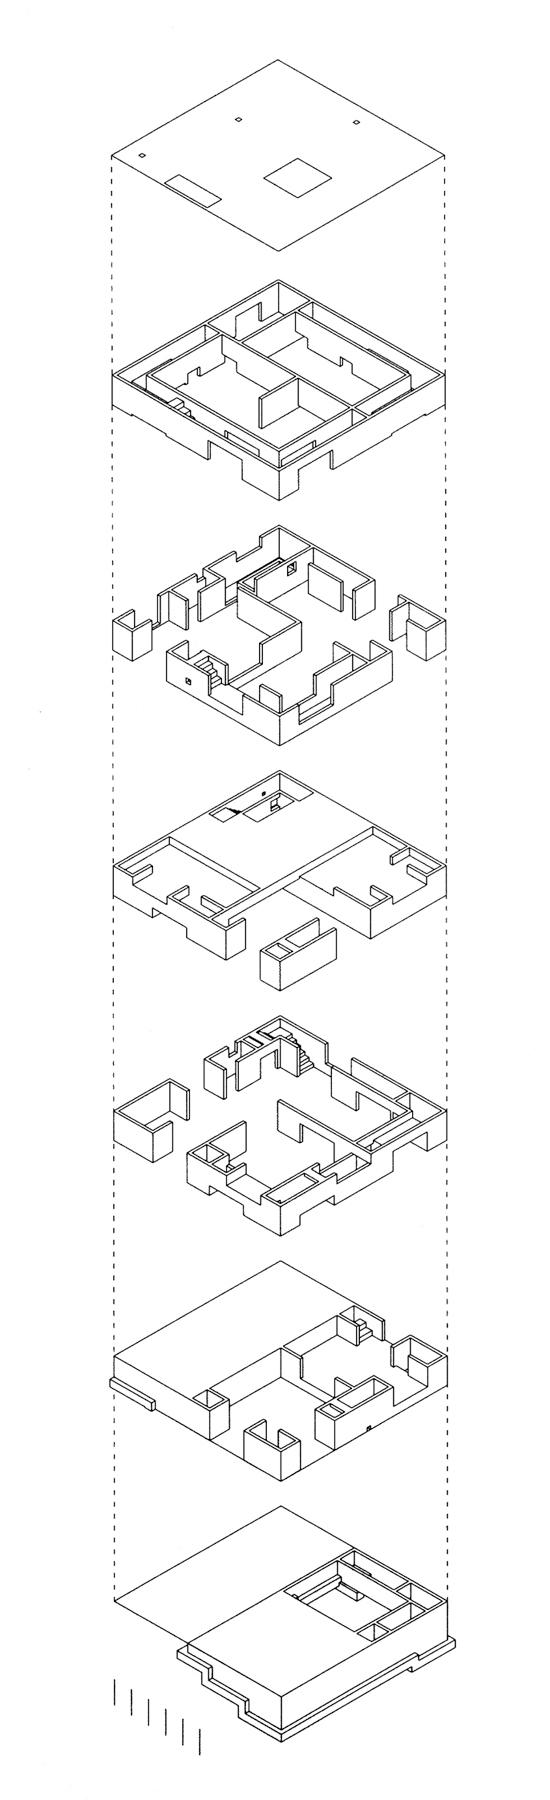 the_tree_mag-poli-house-by-pezo-von-ellrichshausen-240.jpg